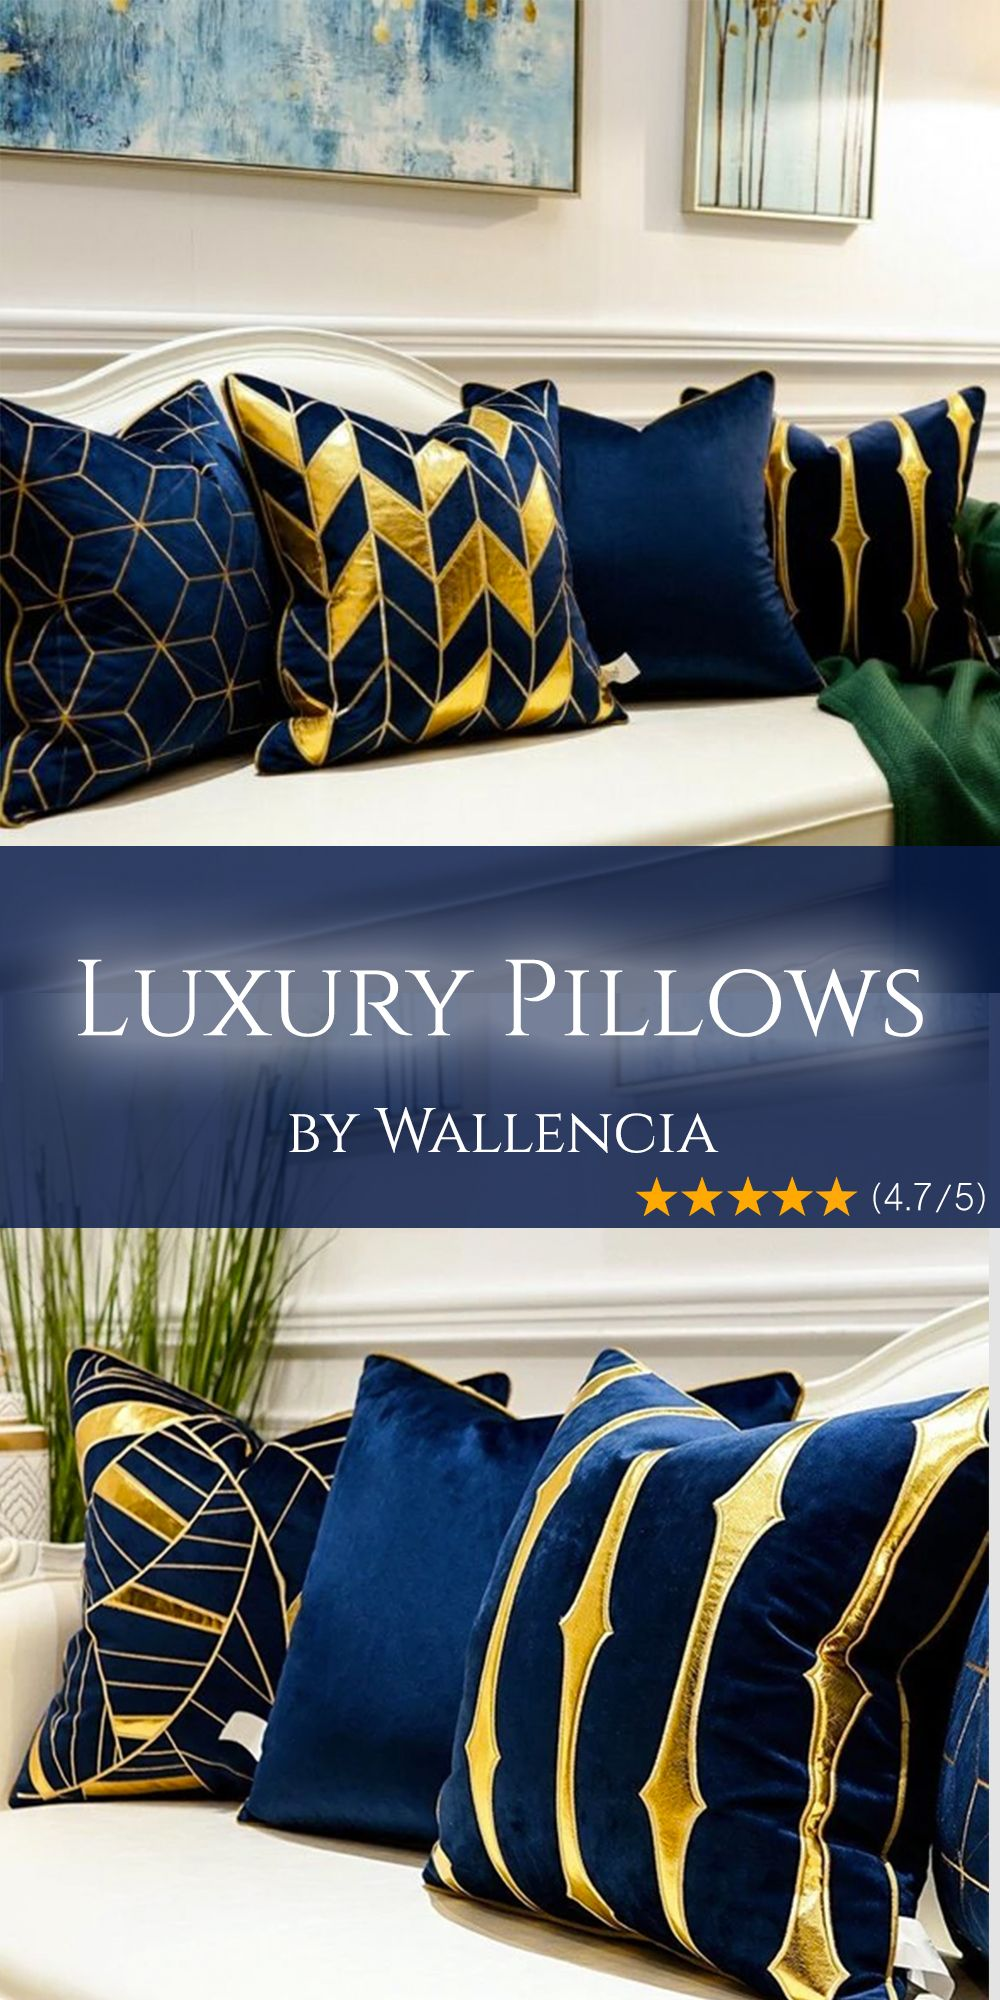 New Metallic Cube Cushion Covers 17 x 17 Inch 43 x 43 Luxury Sofa Soft Square